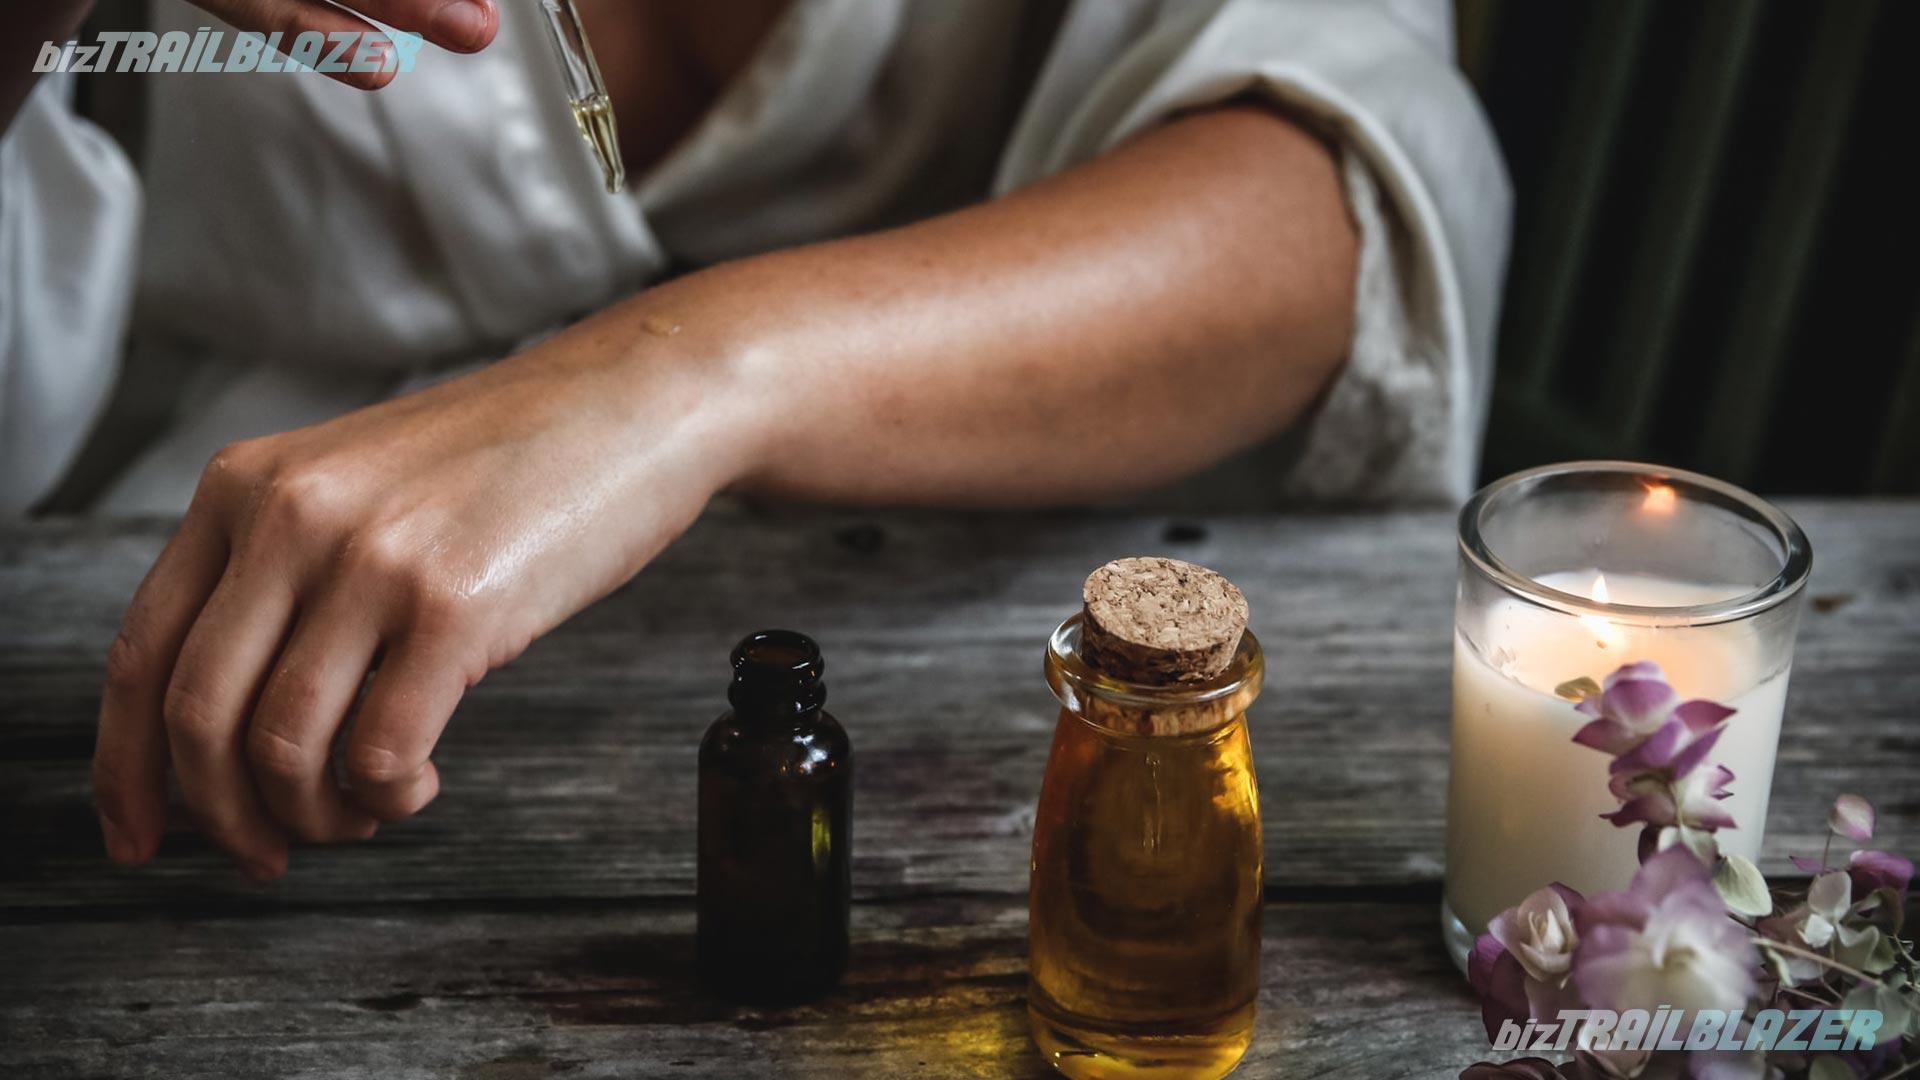 2-CBD-Oil-and-its-5-Surprising-Health-Benefits-BizTrailBlazer-Blog